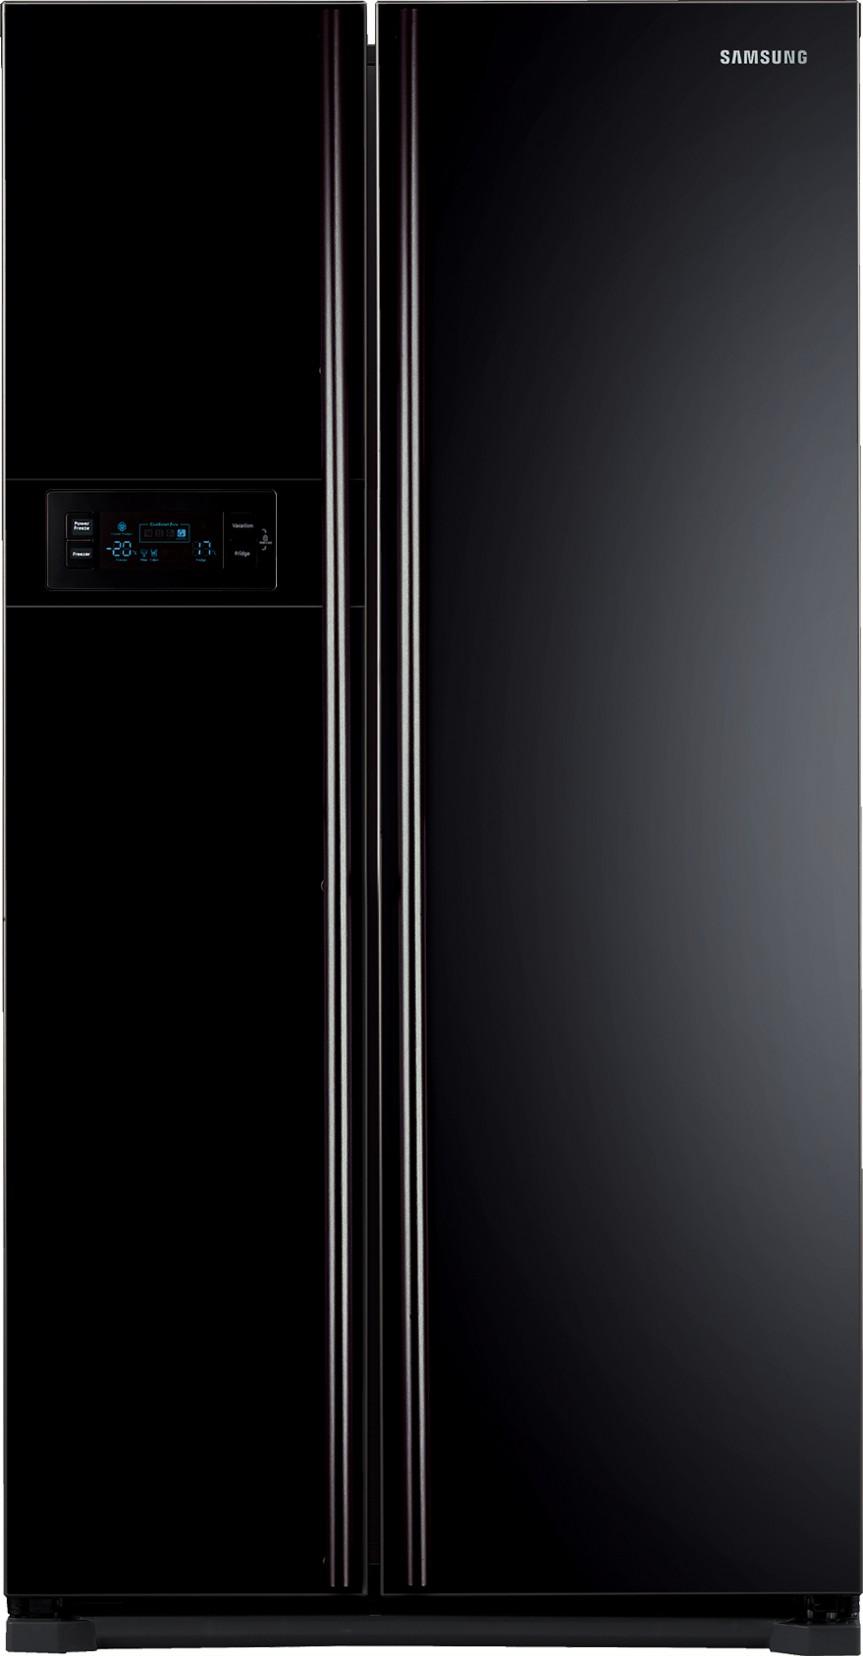 Samsung RSH5SLBG